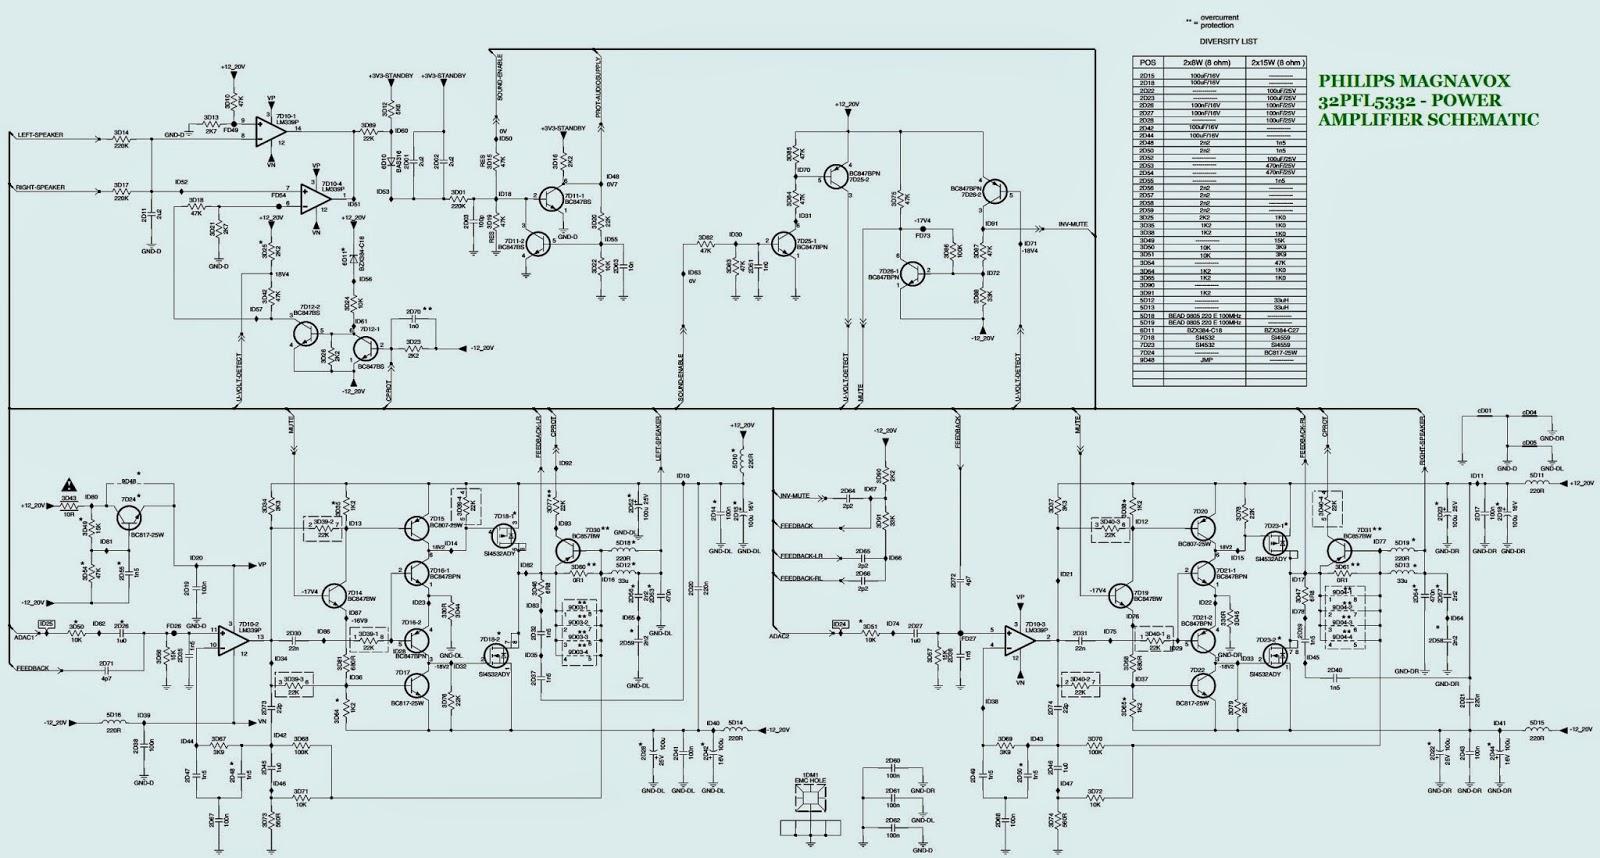 32pfl5332 philips magnavox audio dc to dc converter schematic electro help